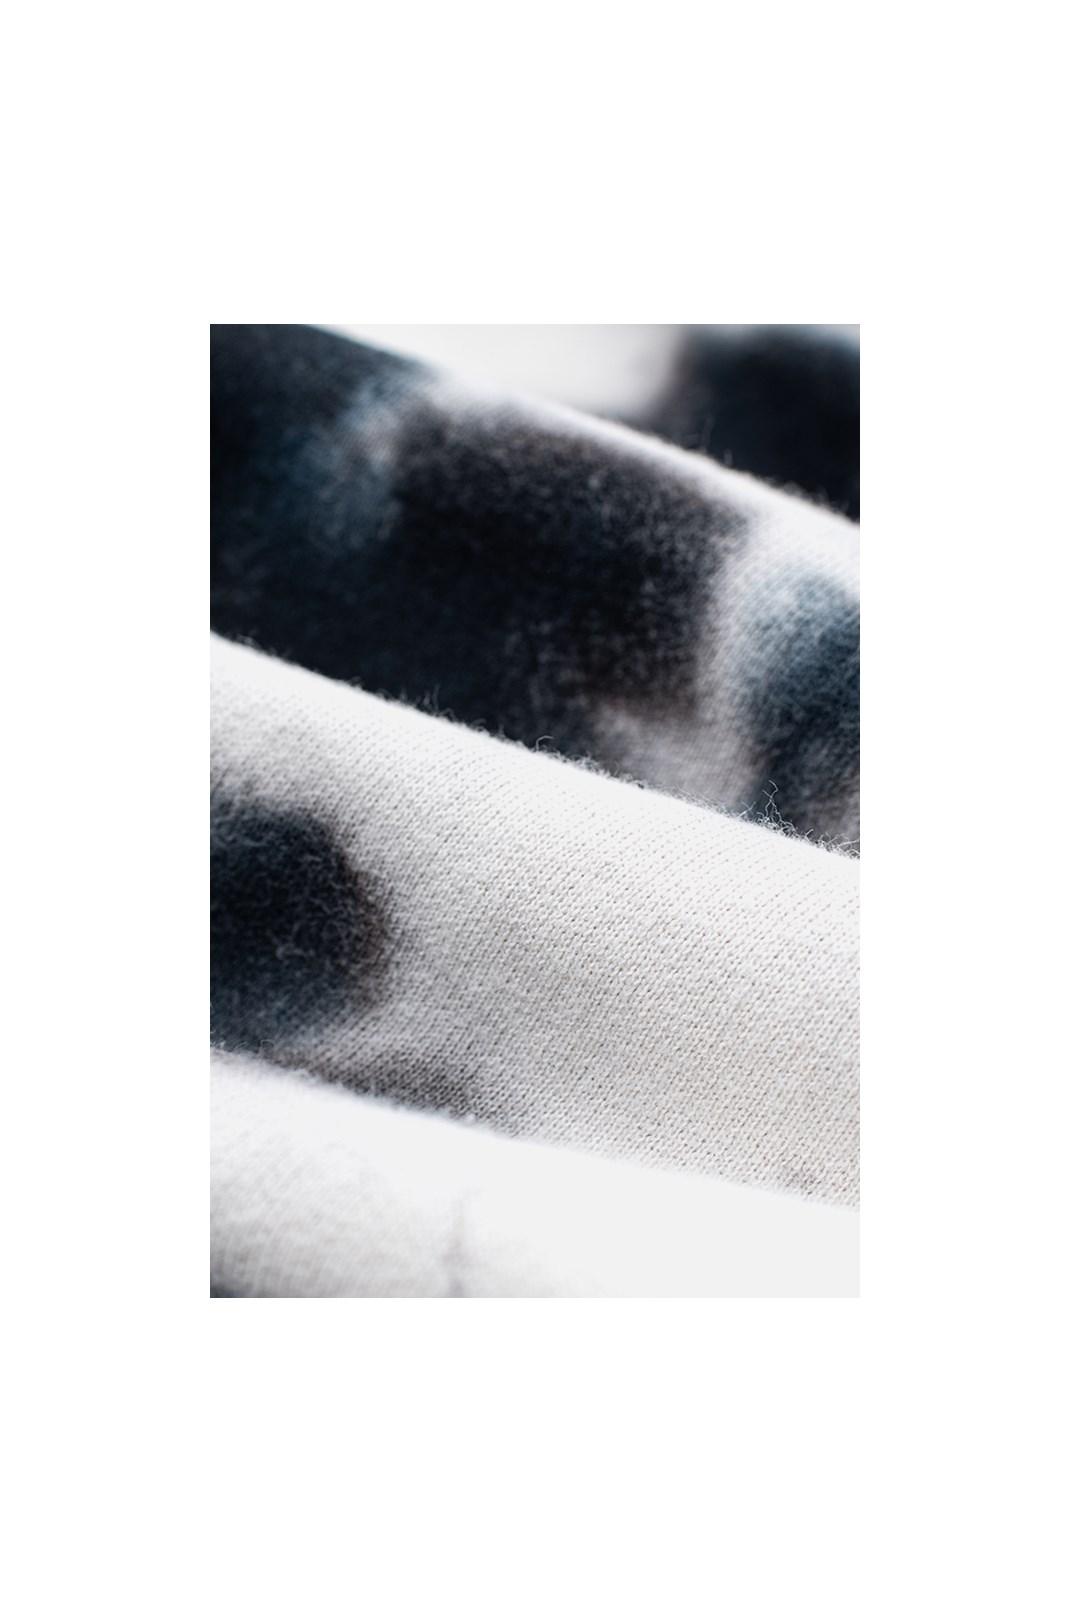 Moletom Canguru Approve Animals Dobermann Tie Dye Branco e Preto